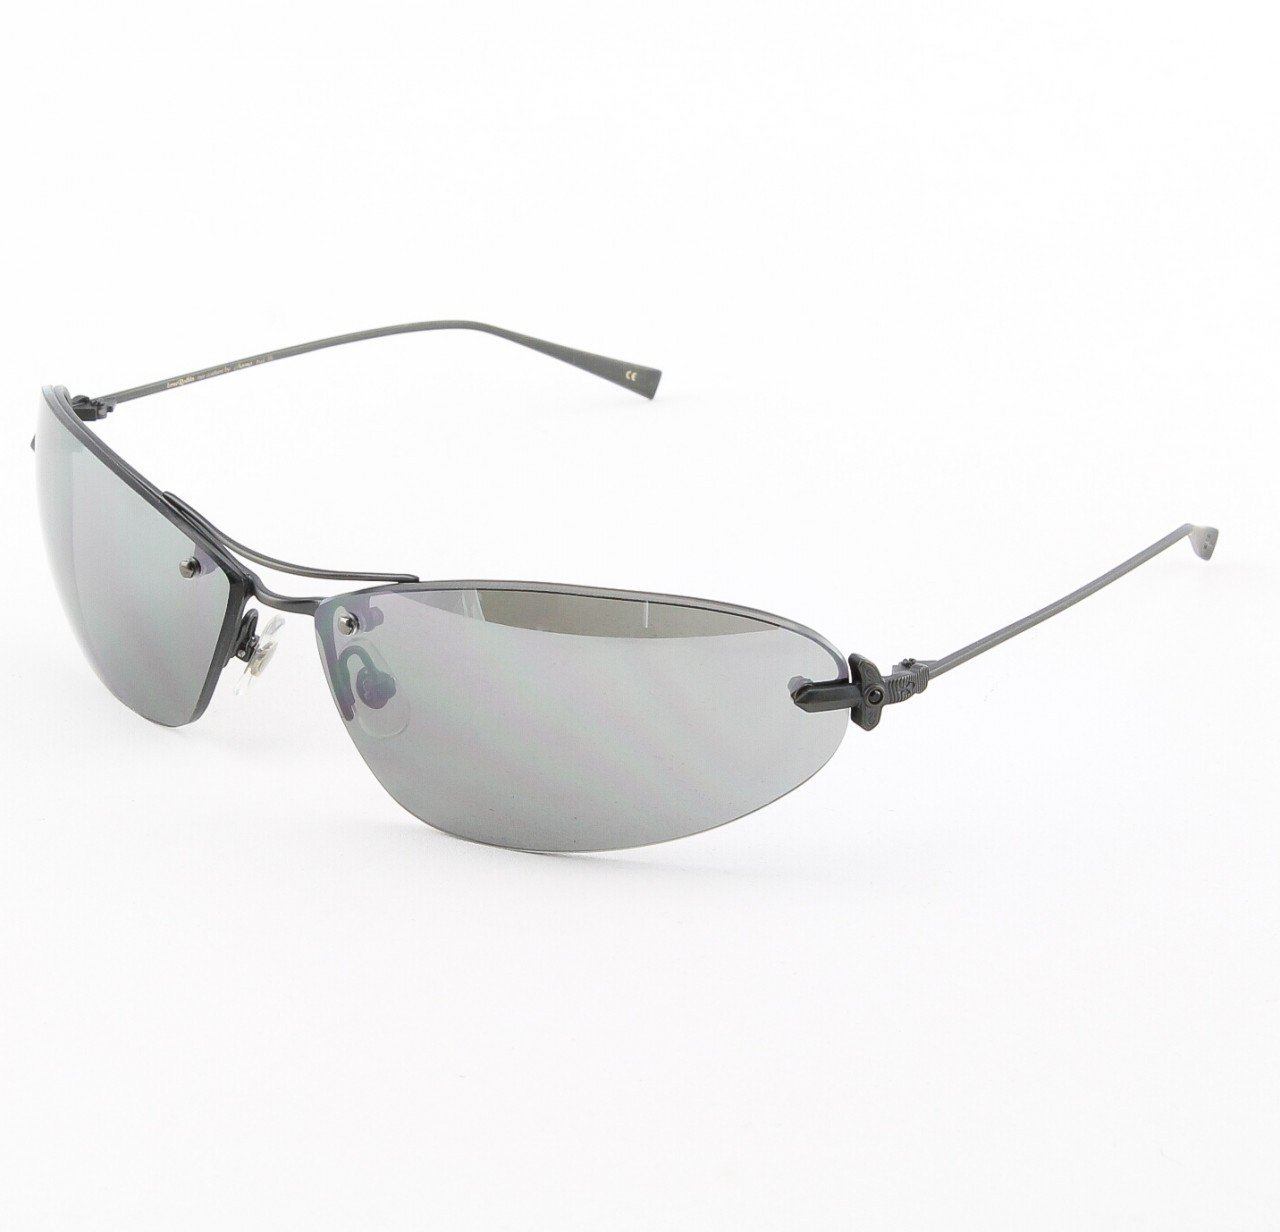 Loree Rodkin Brad Sunglasses by Sama Col. Black with Gray Lenses and Swarovski Crystals